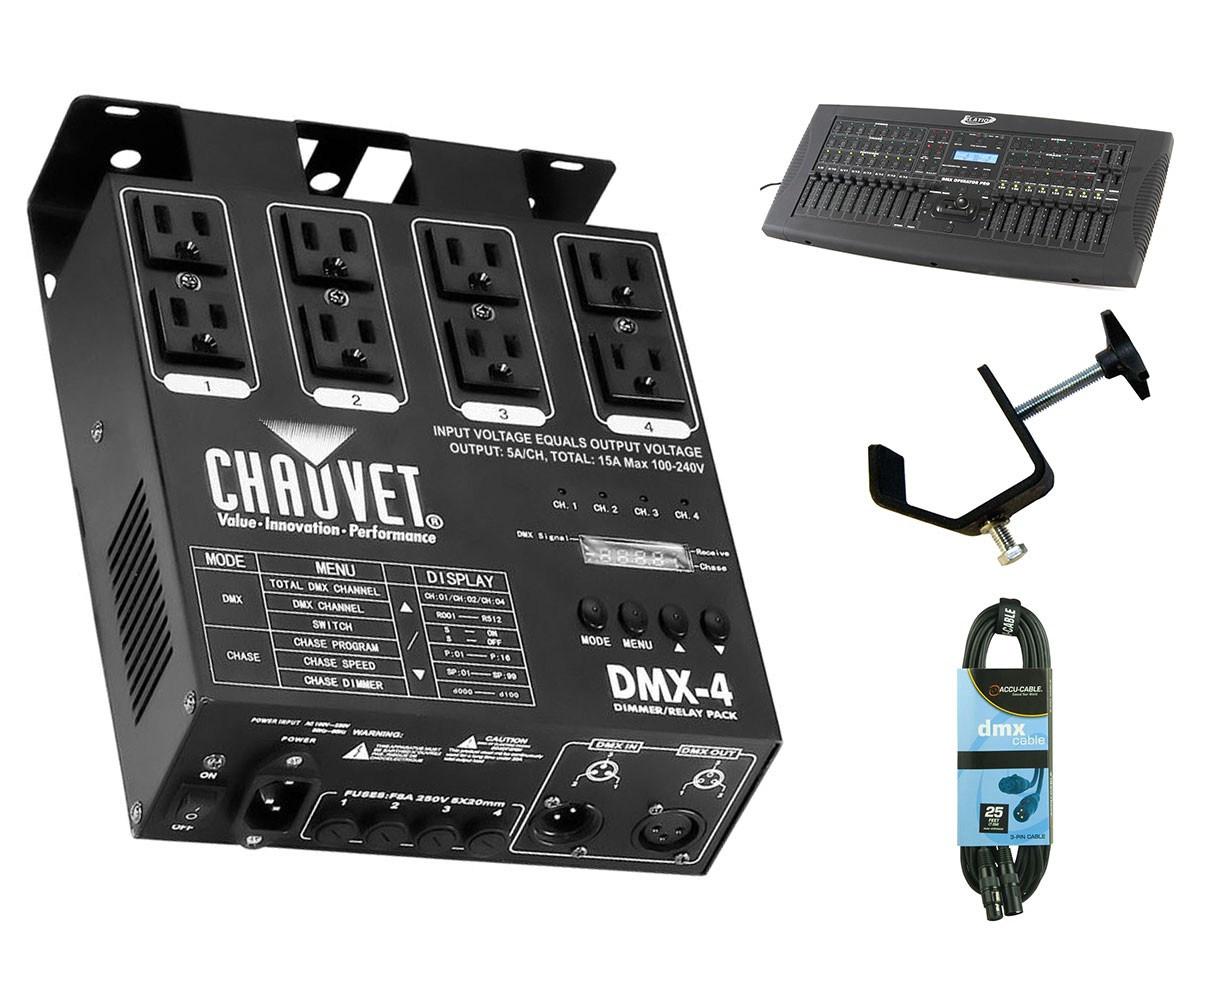 CHAUVET DJ DMX-4 + DMX Operator Pro + Clamp + Cable